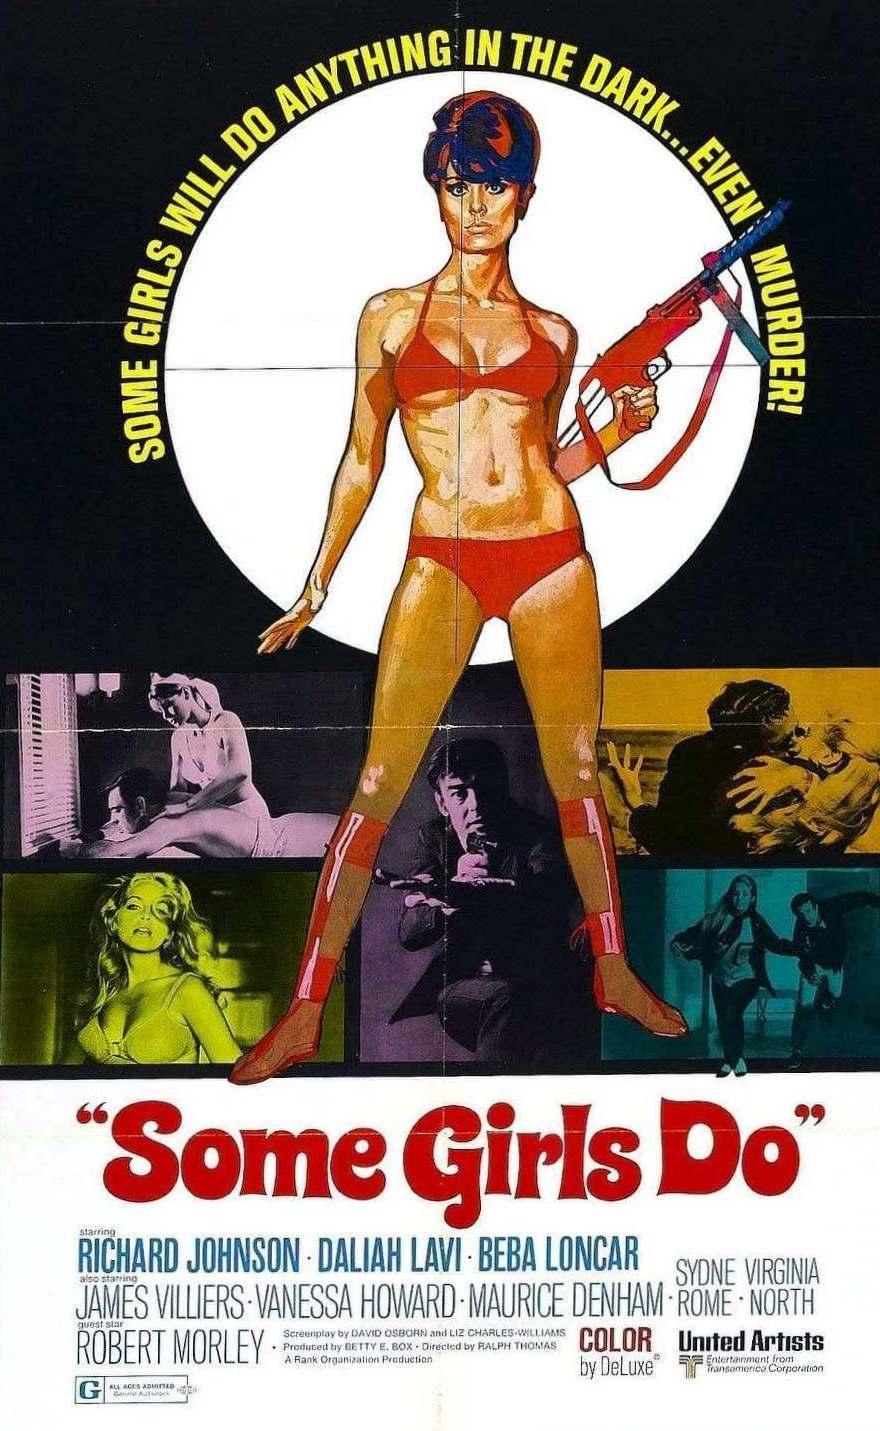 Some Girls Do (1969) poster